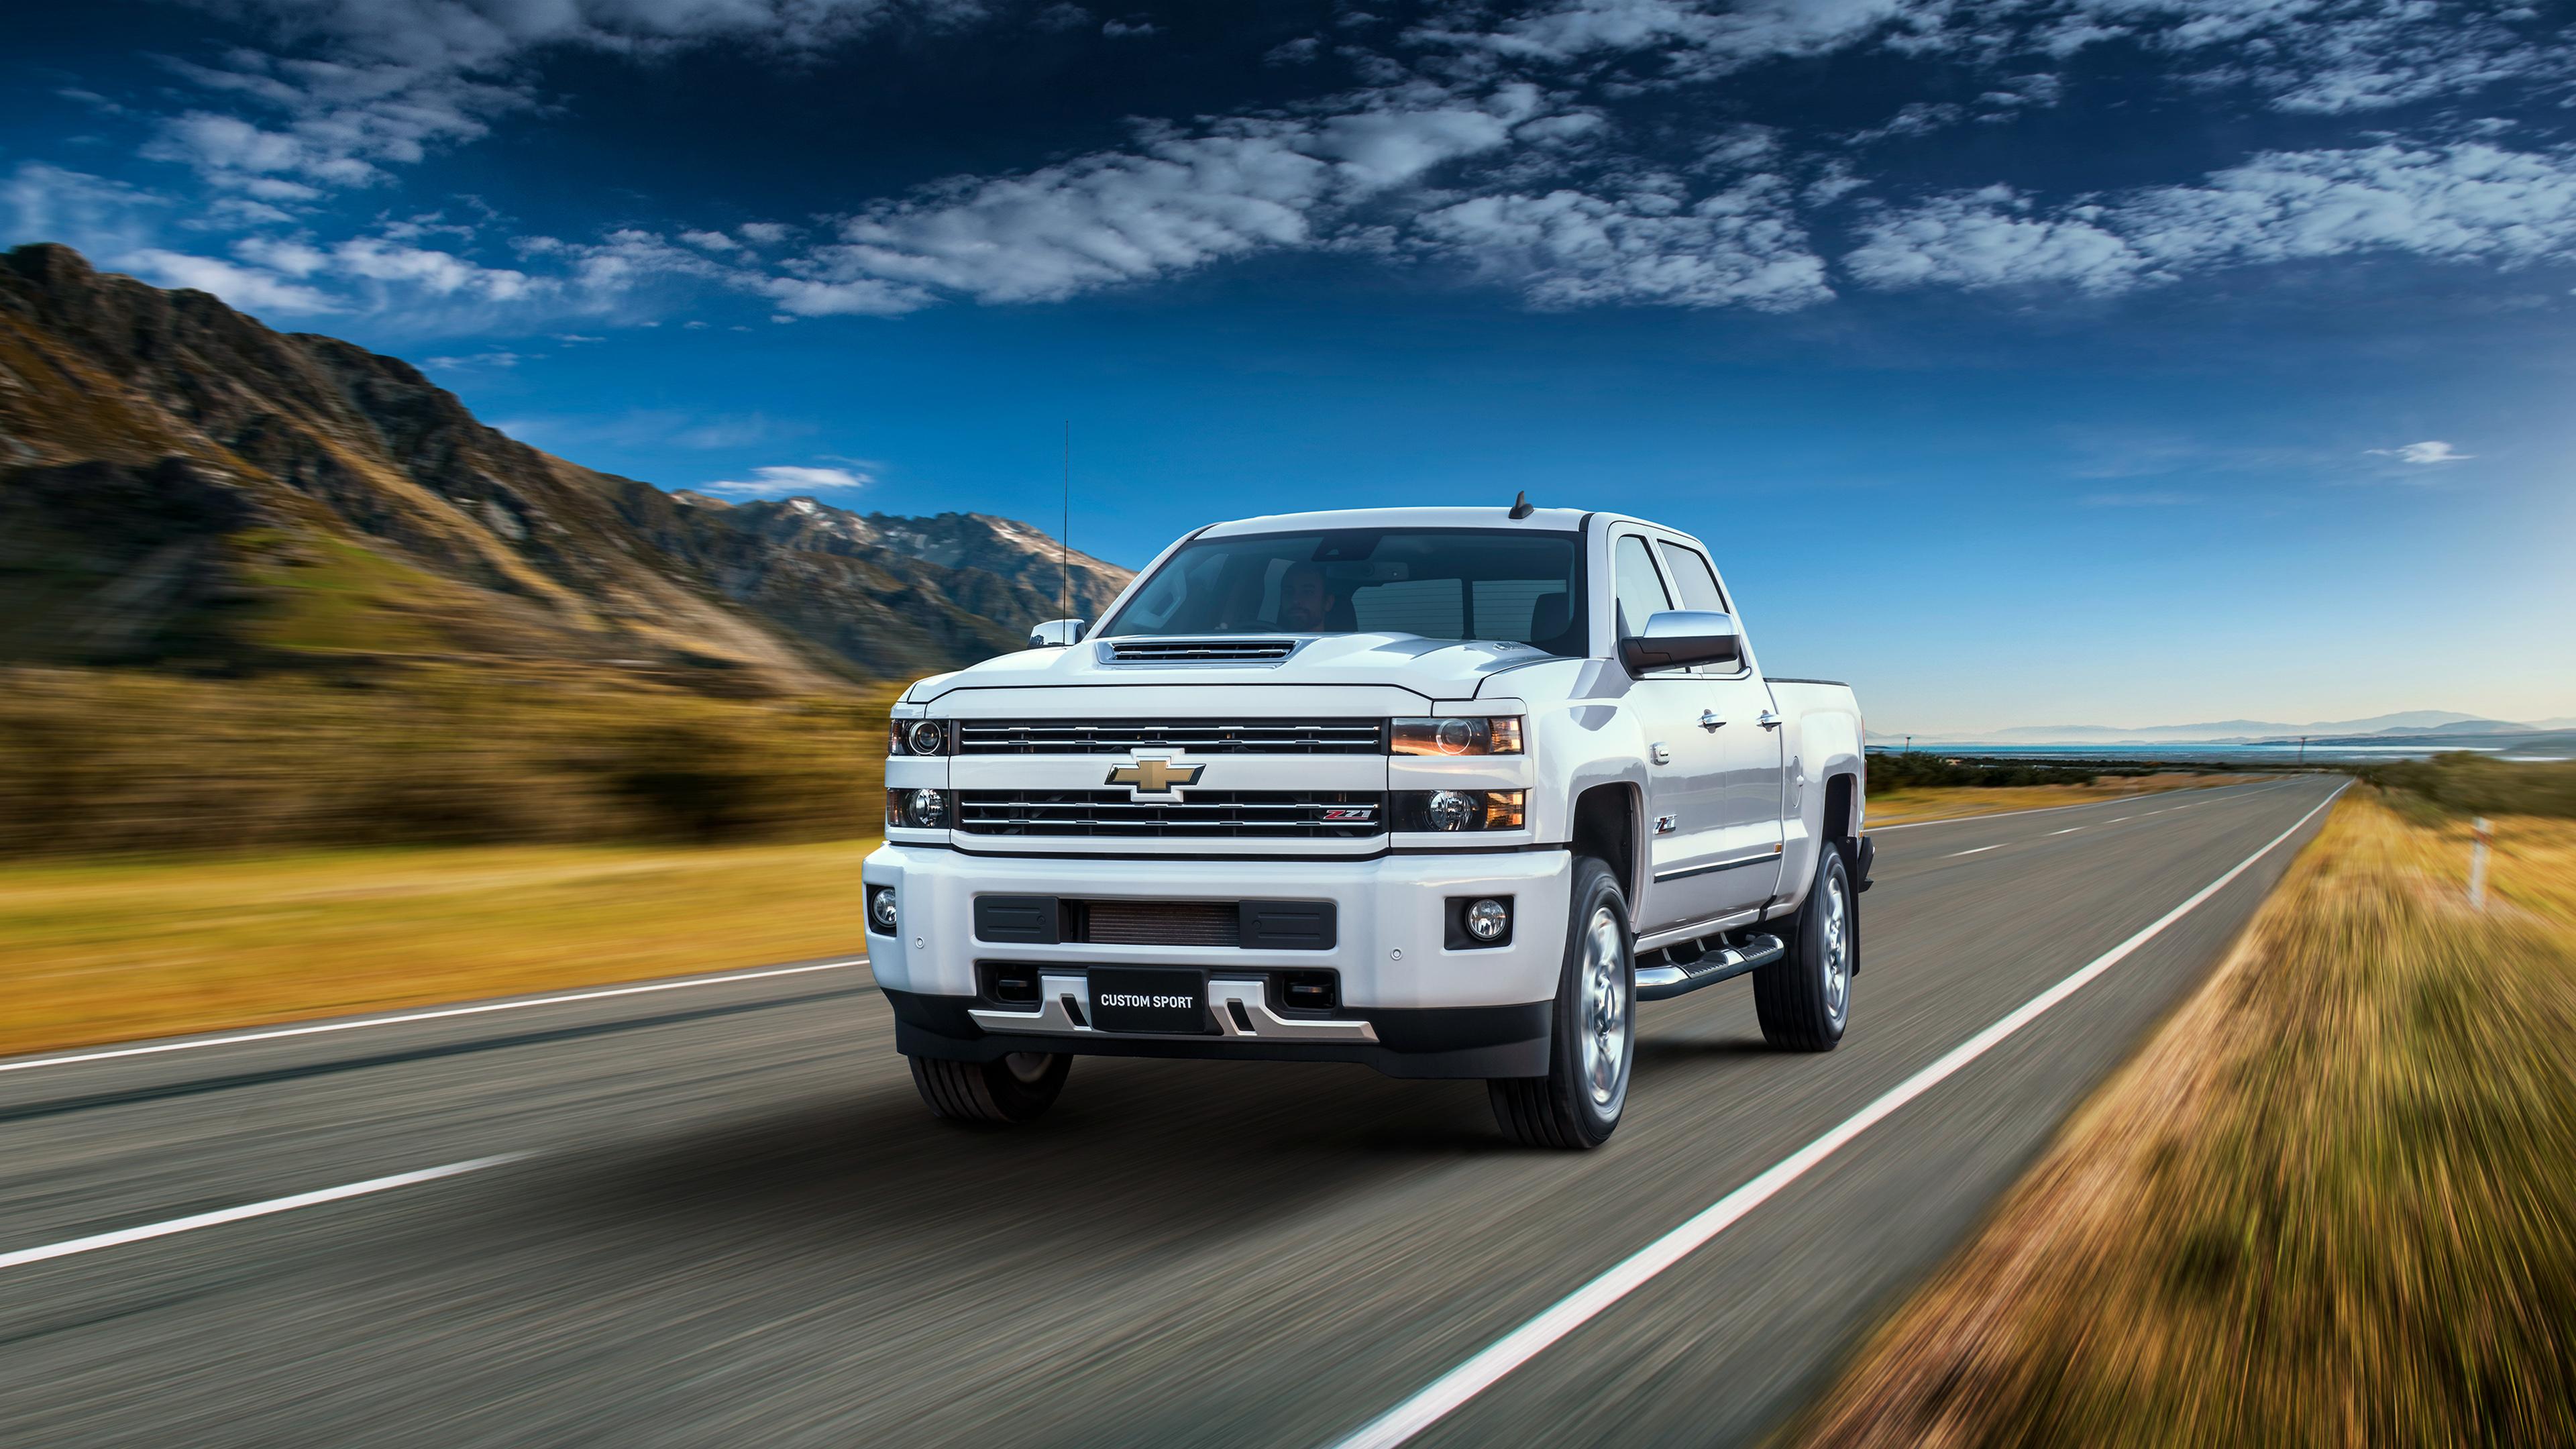 Chevrolet Silverado 2500 Hd Ltz Custom Sport Crew Cab 2018 4k